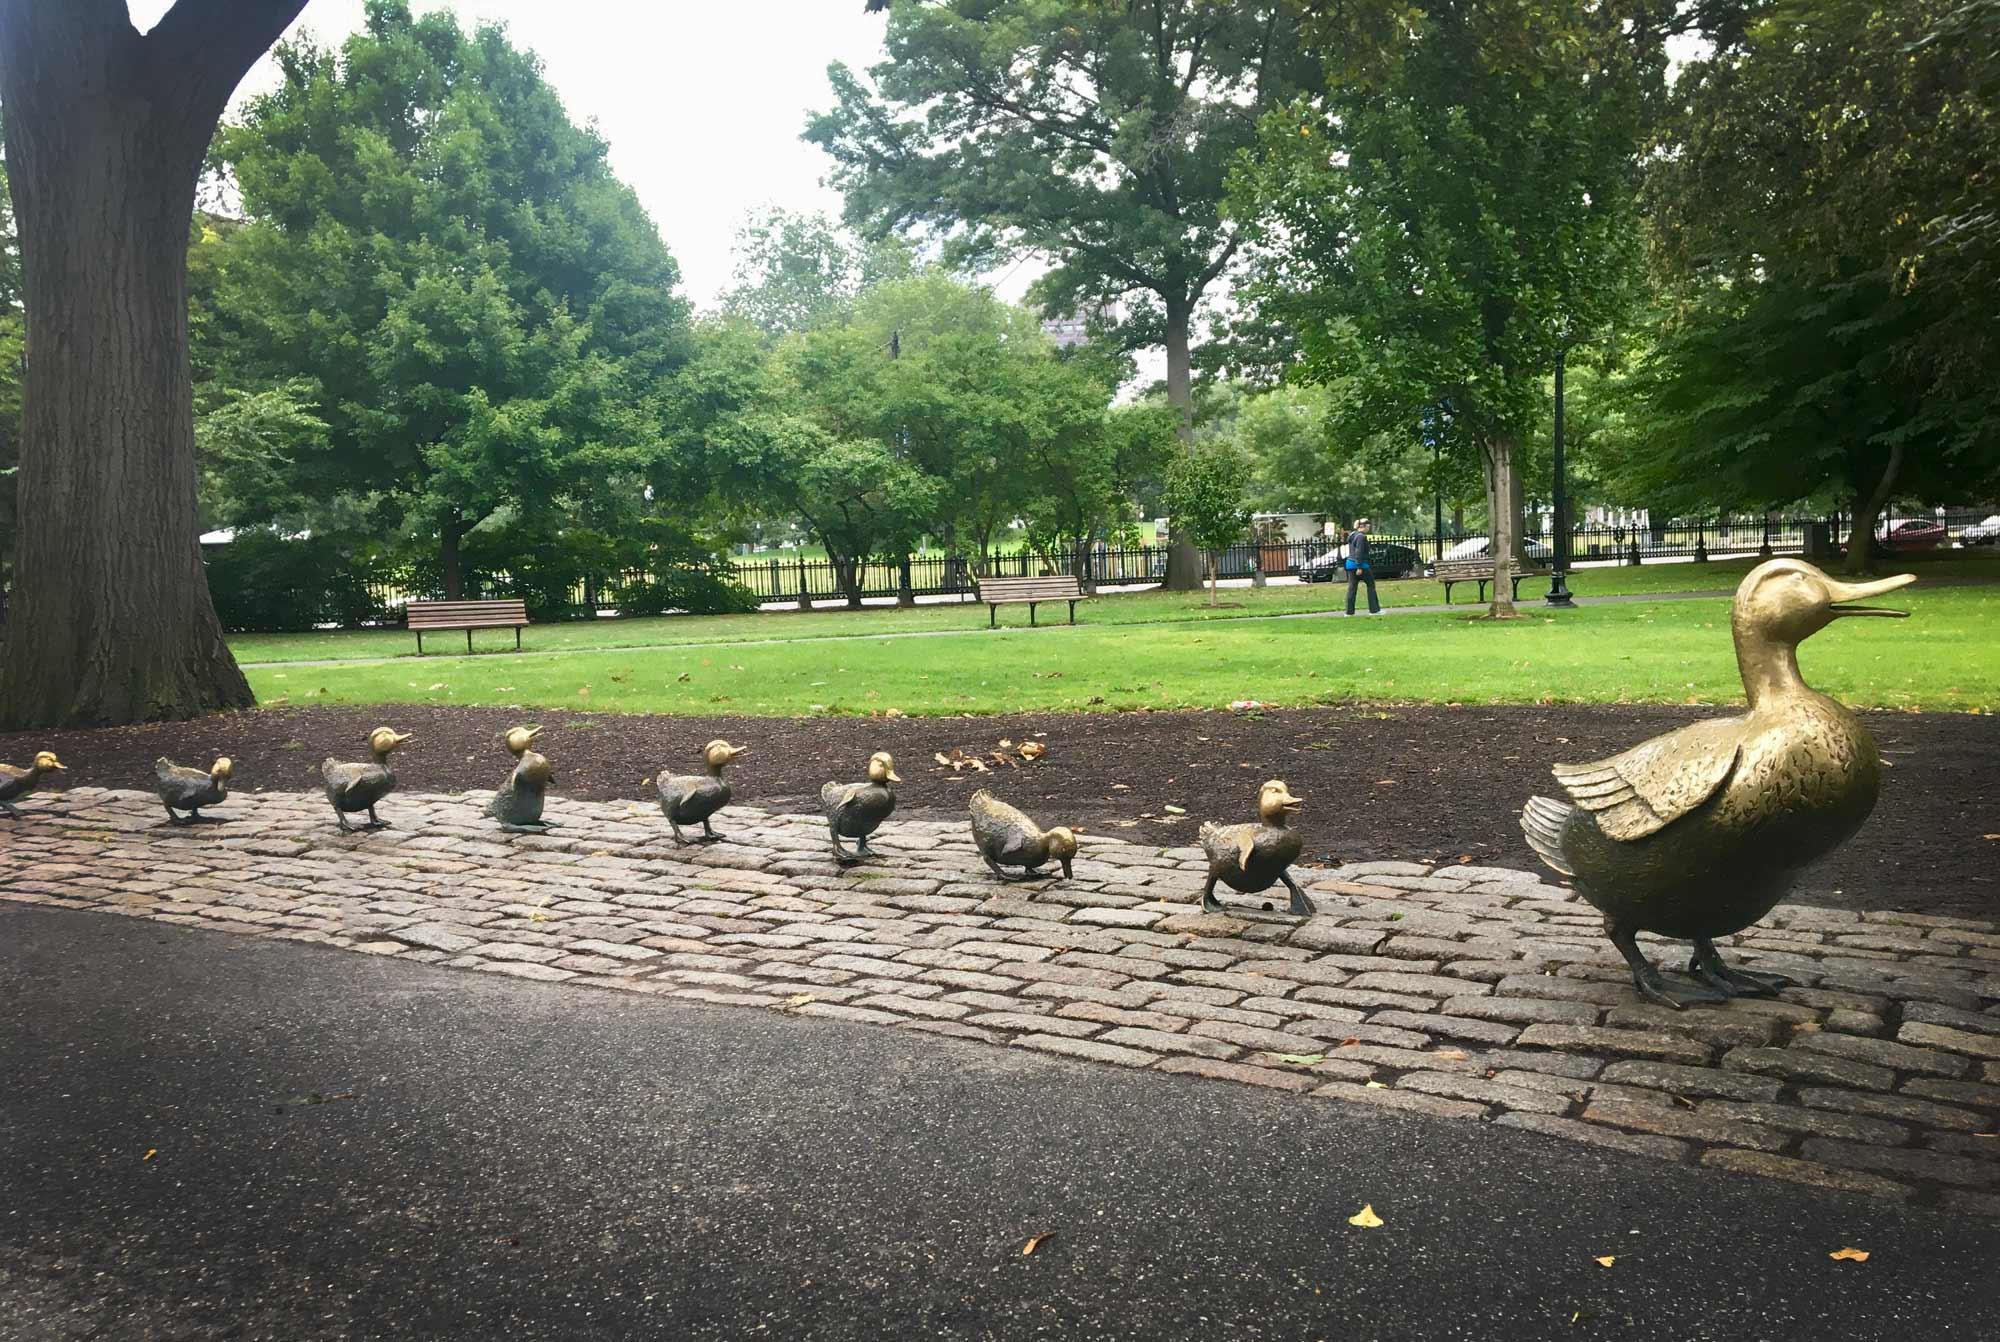 Bronze statues of Make Way for Ducklings in Boston Public Garden, Boston, Massachusetts